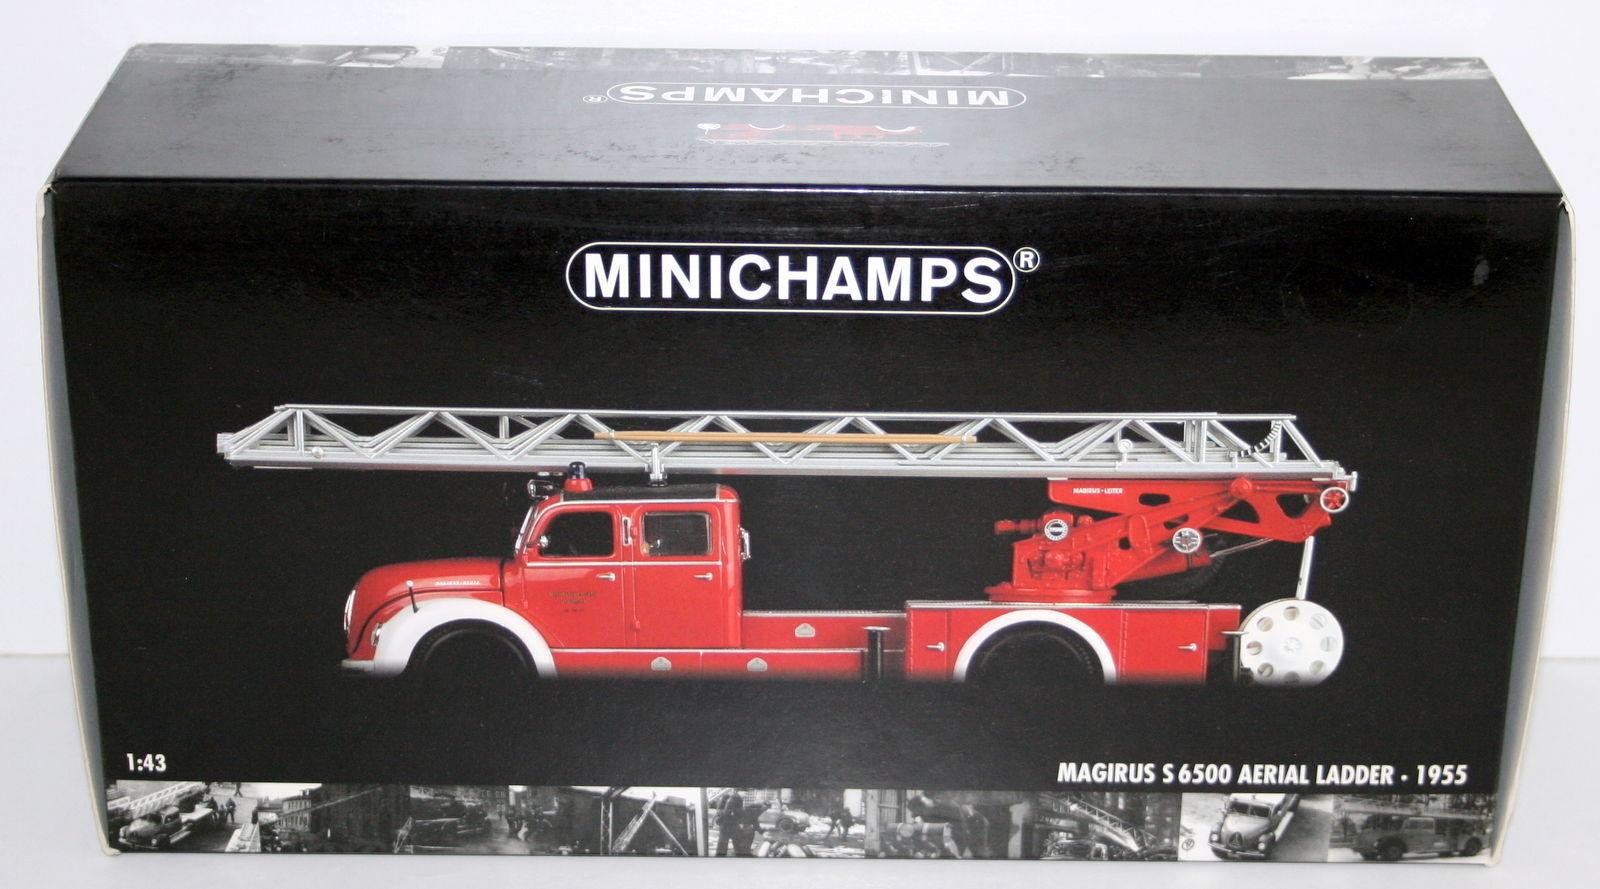 buena calidad MINICHAMPS 1 43 - 439 140071 MAGIRUS S 6500 AERIAL AERIAL AERIAL LADDER   rojo blanco 1955  ganancia cero